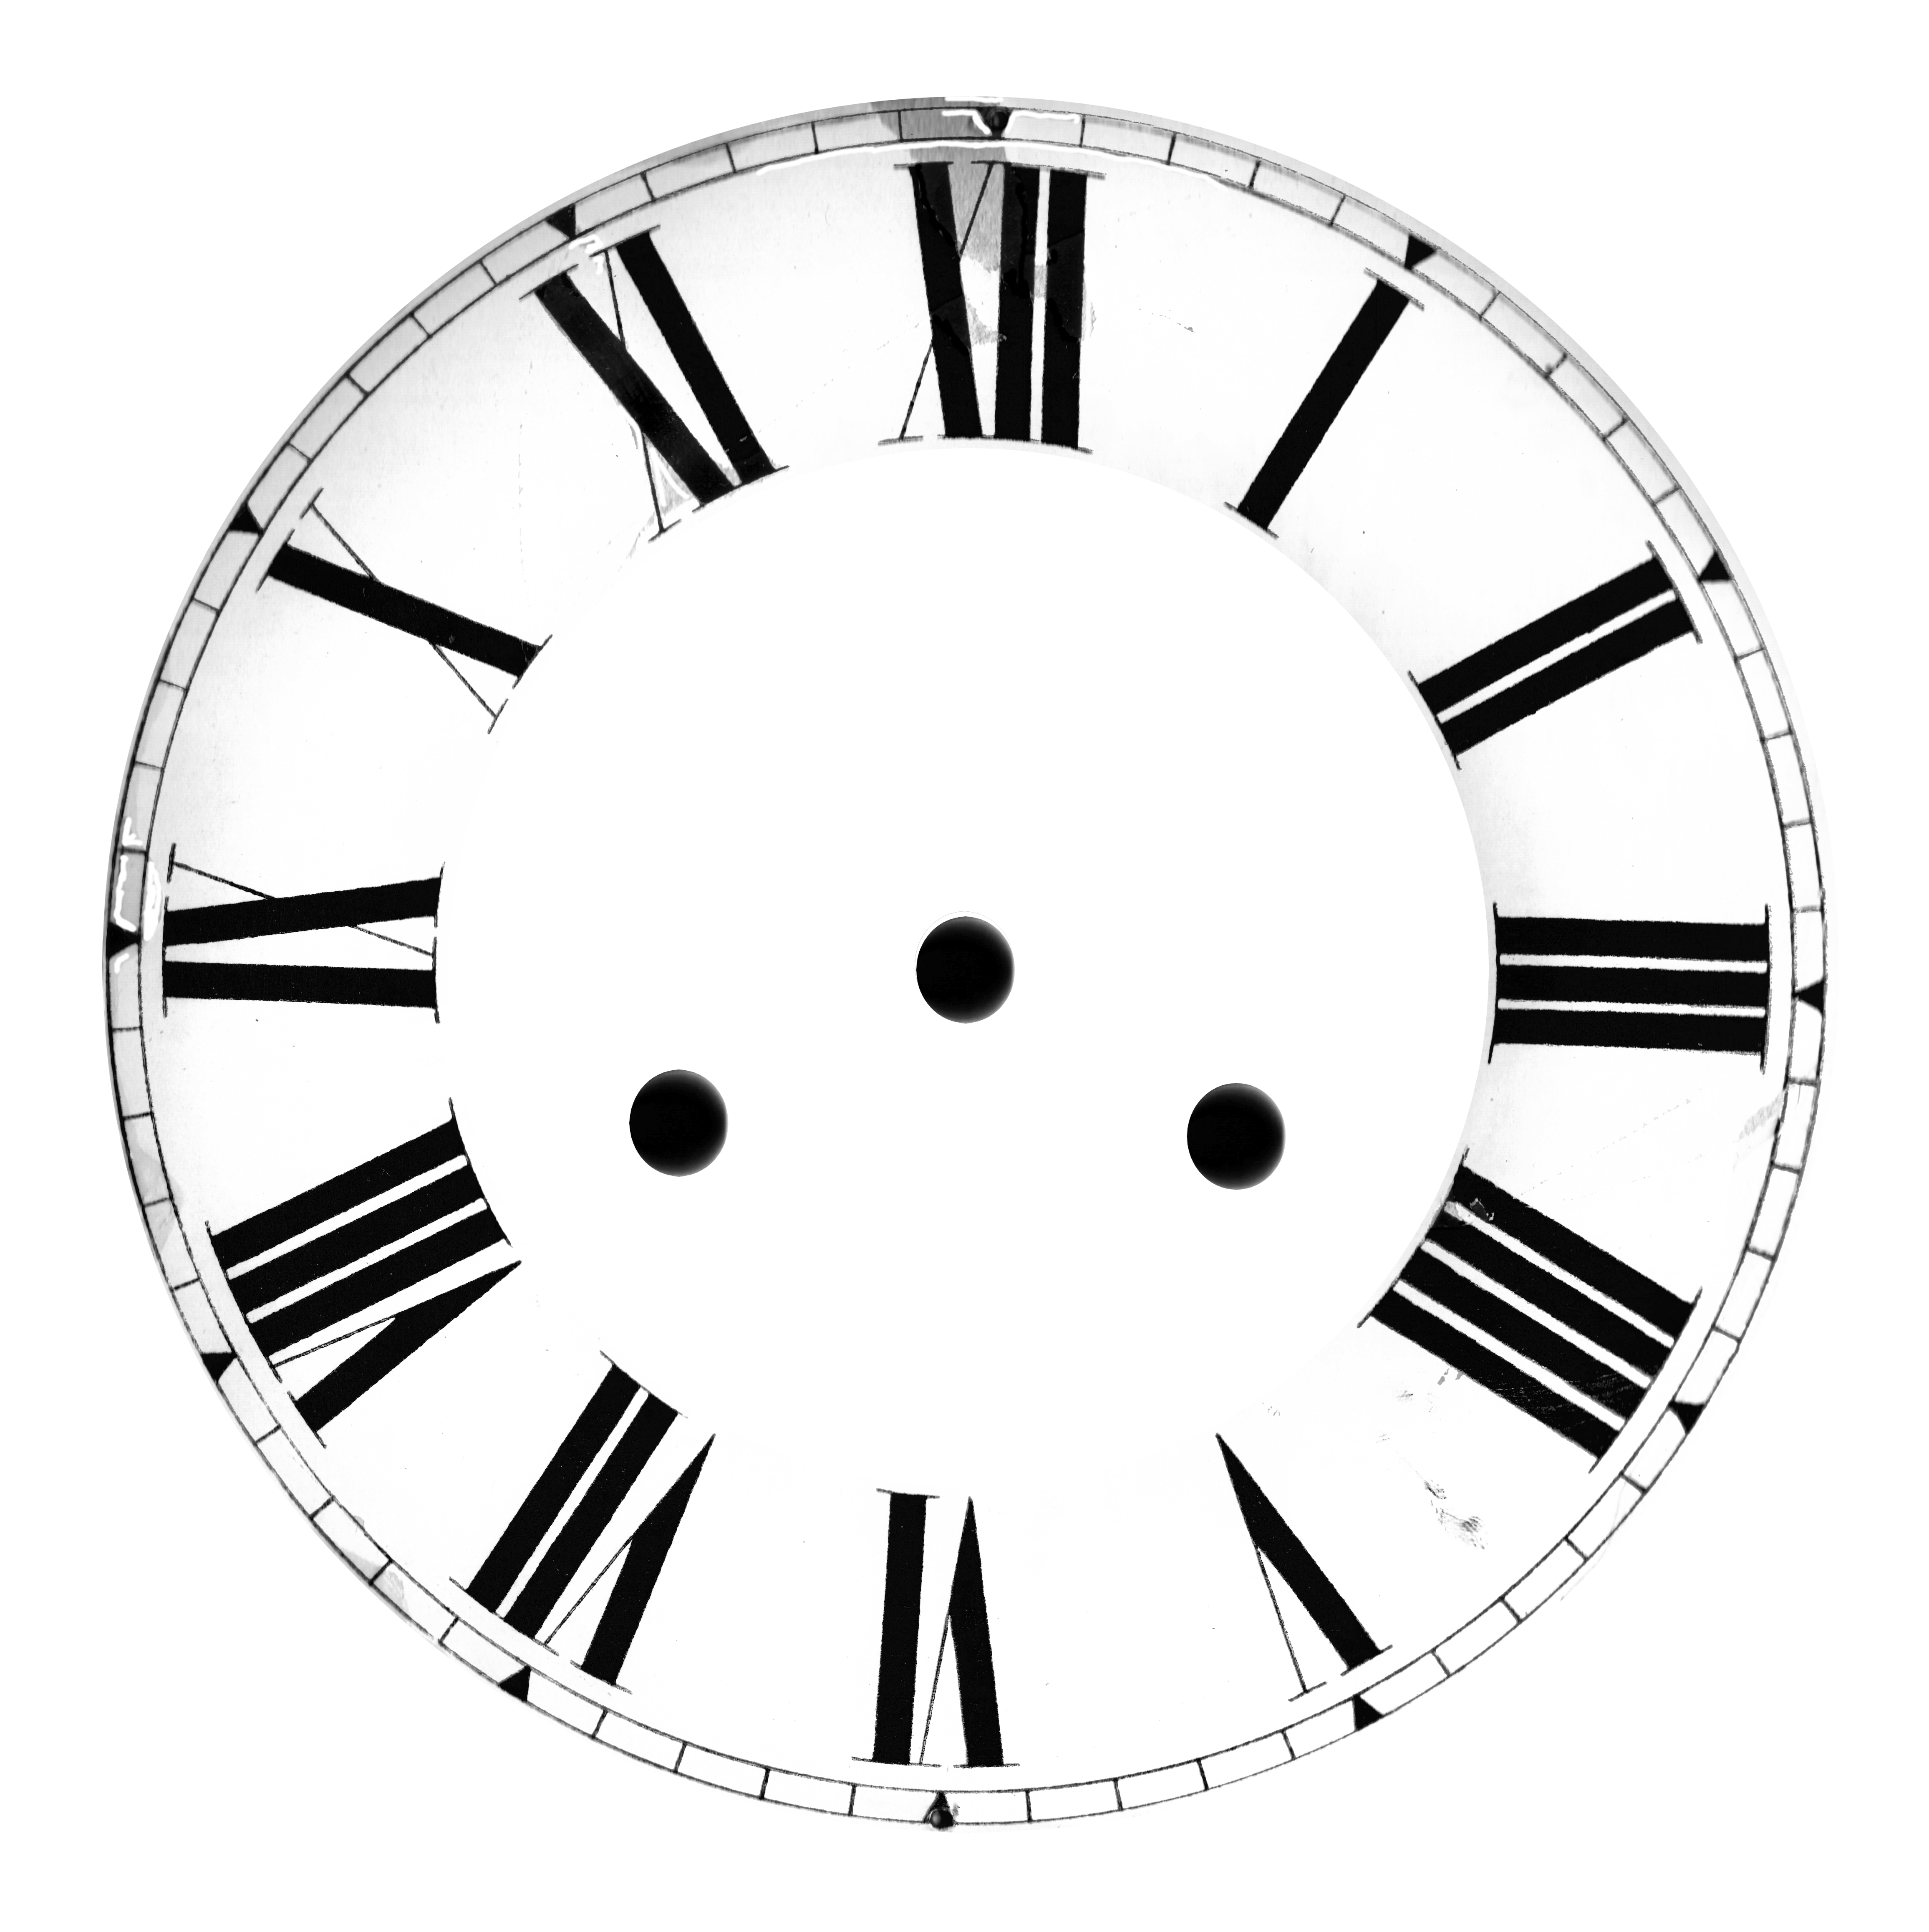 img/clock/clock_face.png